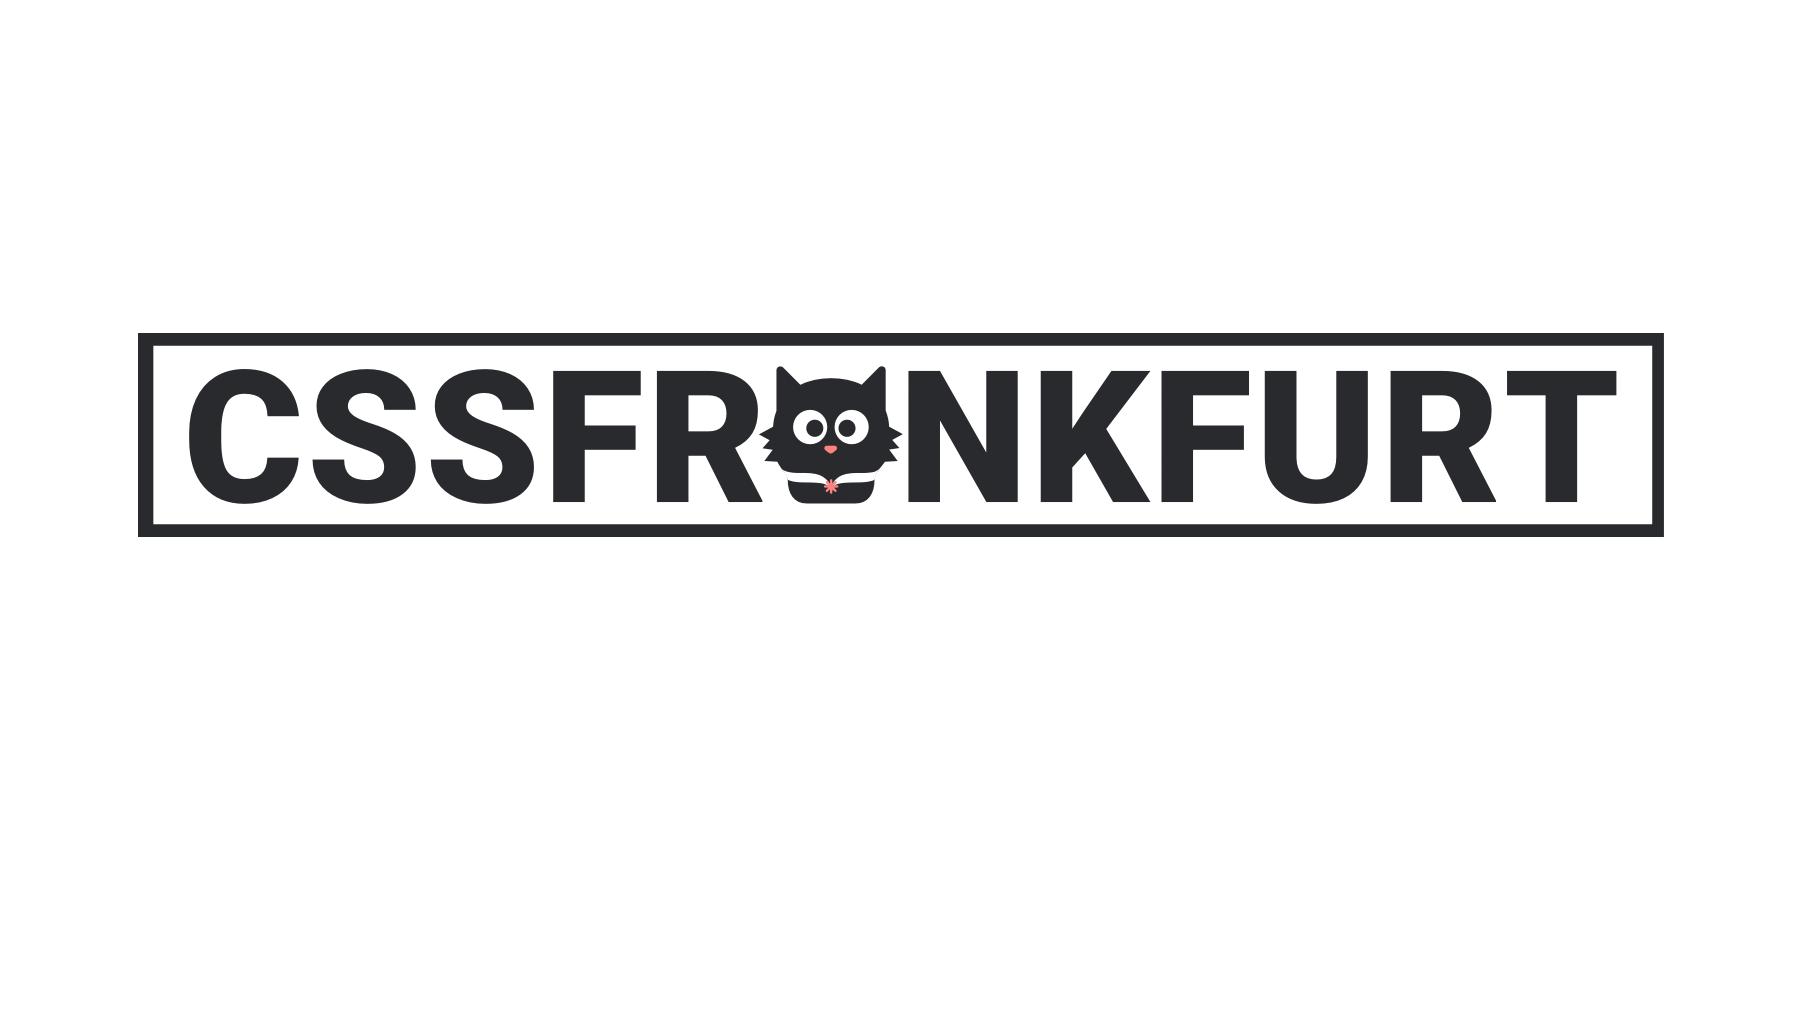 CSS Frankfurt